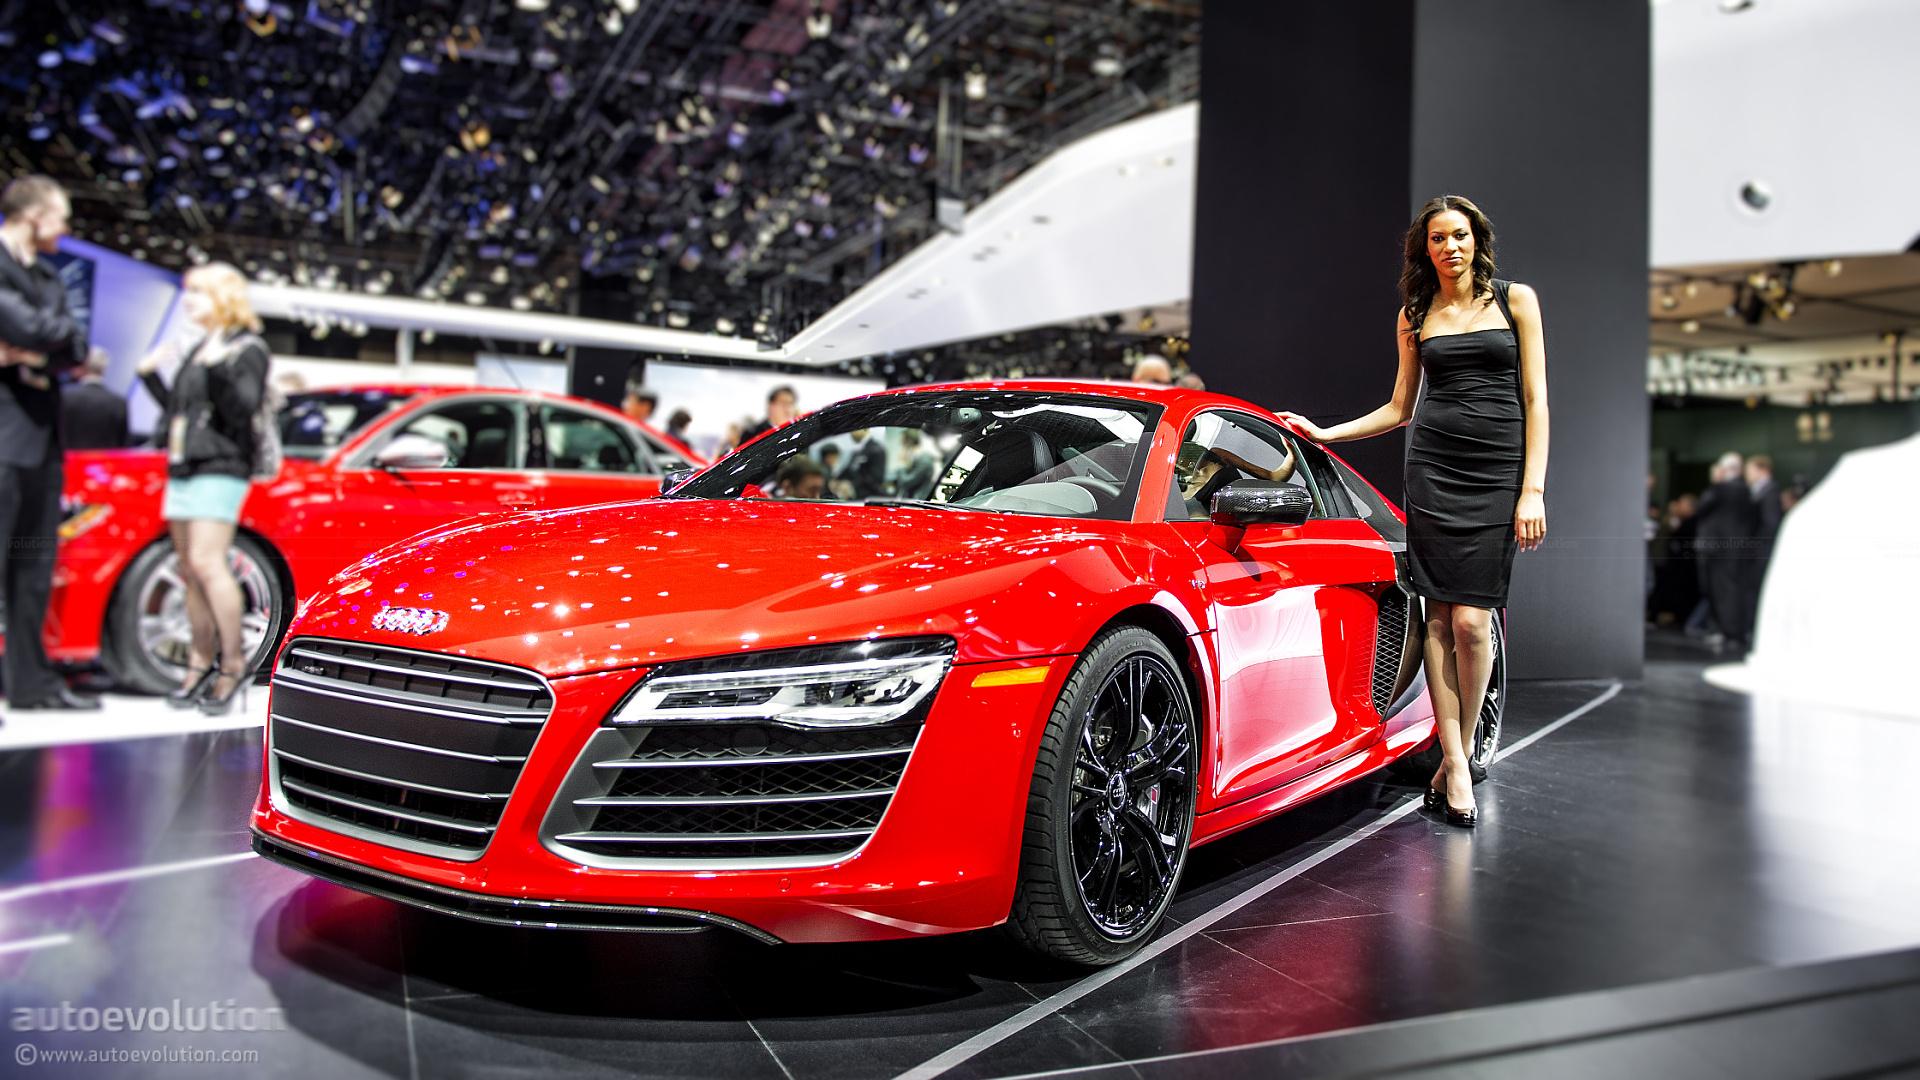 Racing Car Wallpaper 1080p 2013 Naias Audi R8 Facelift Live Photos Autoevolution